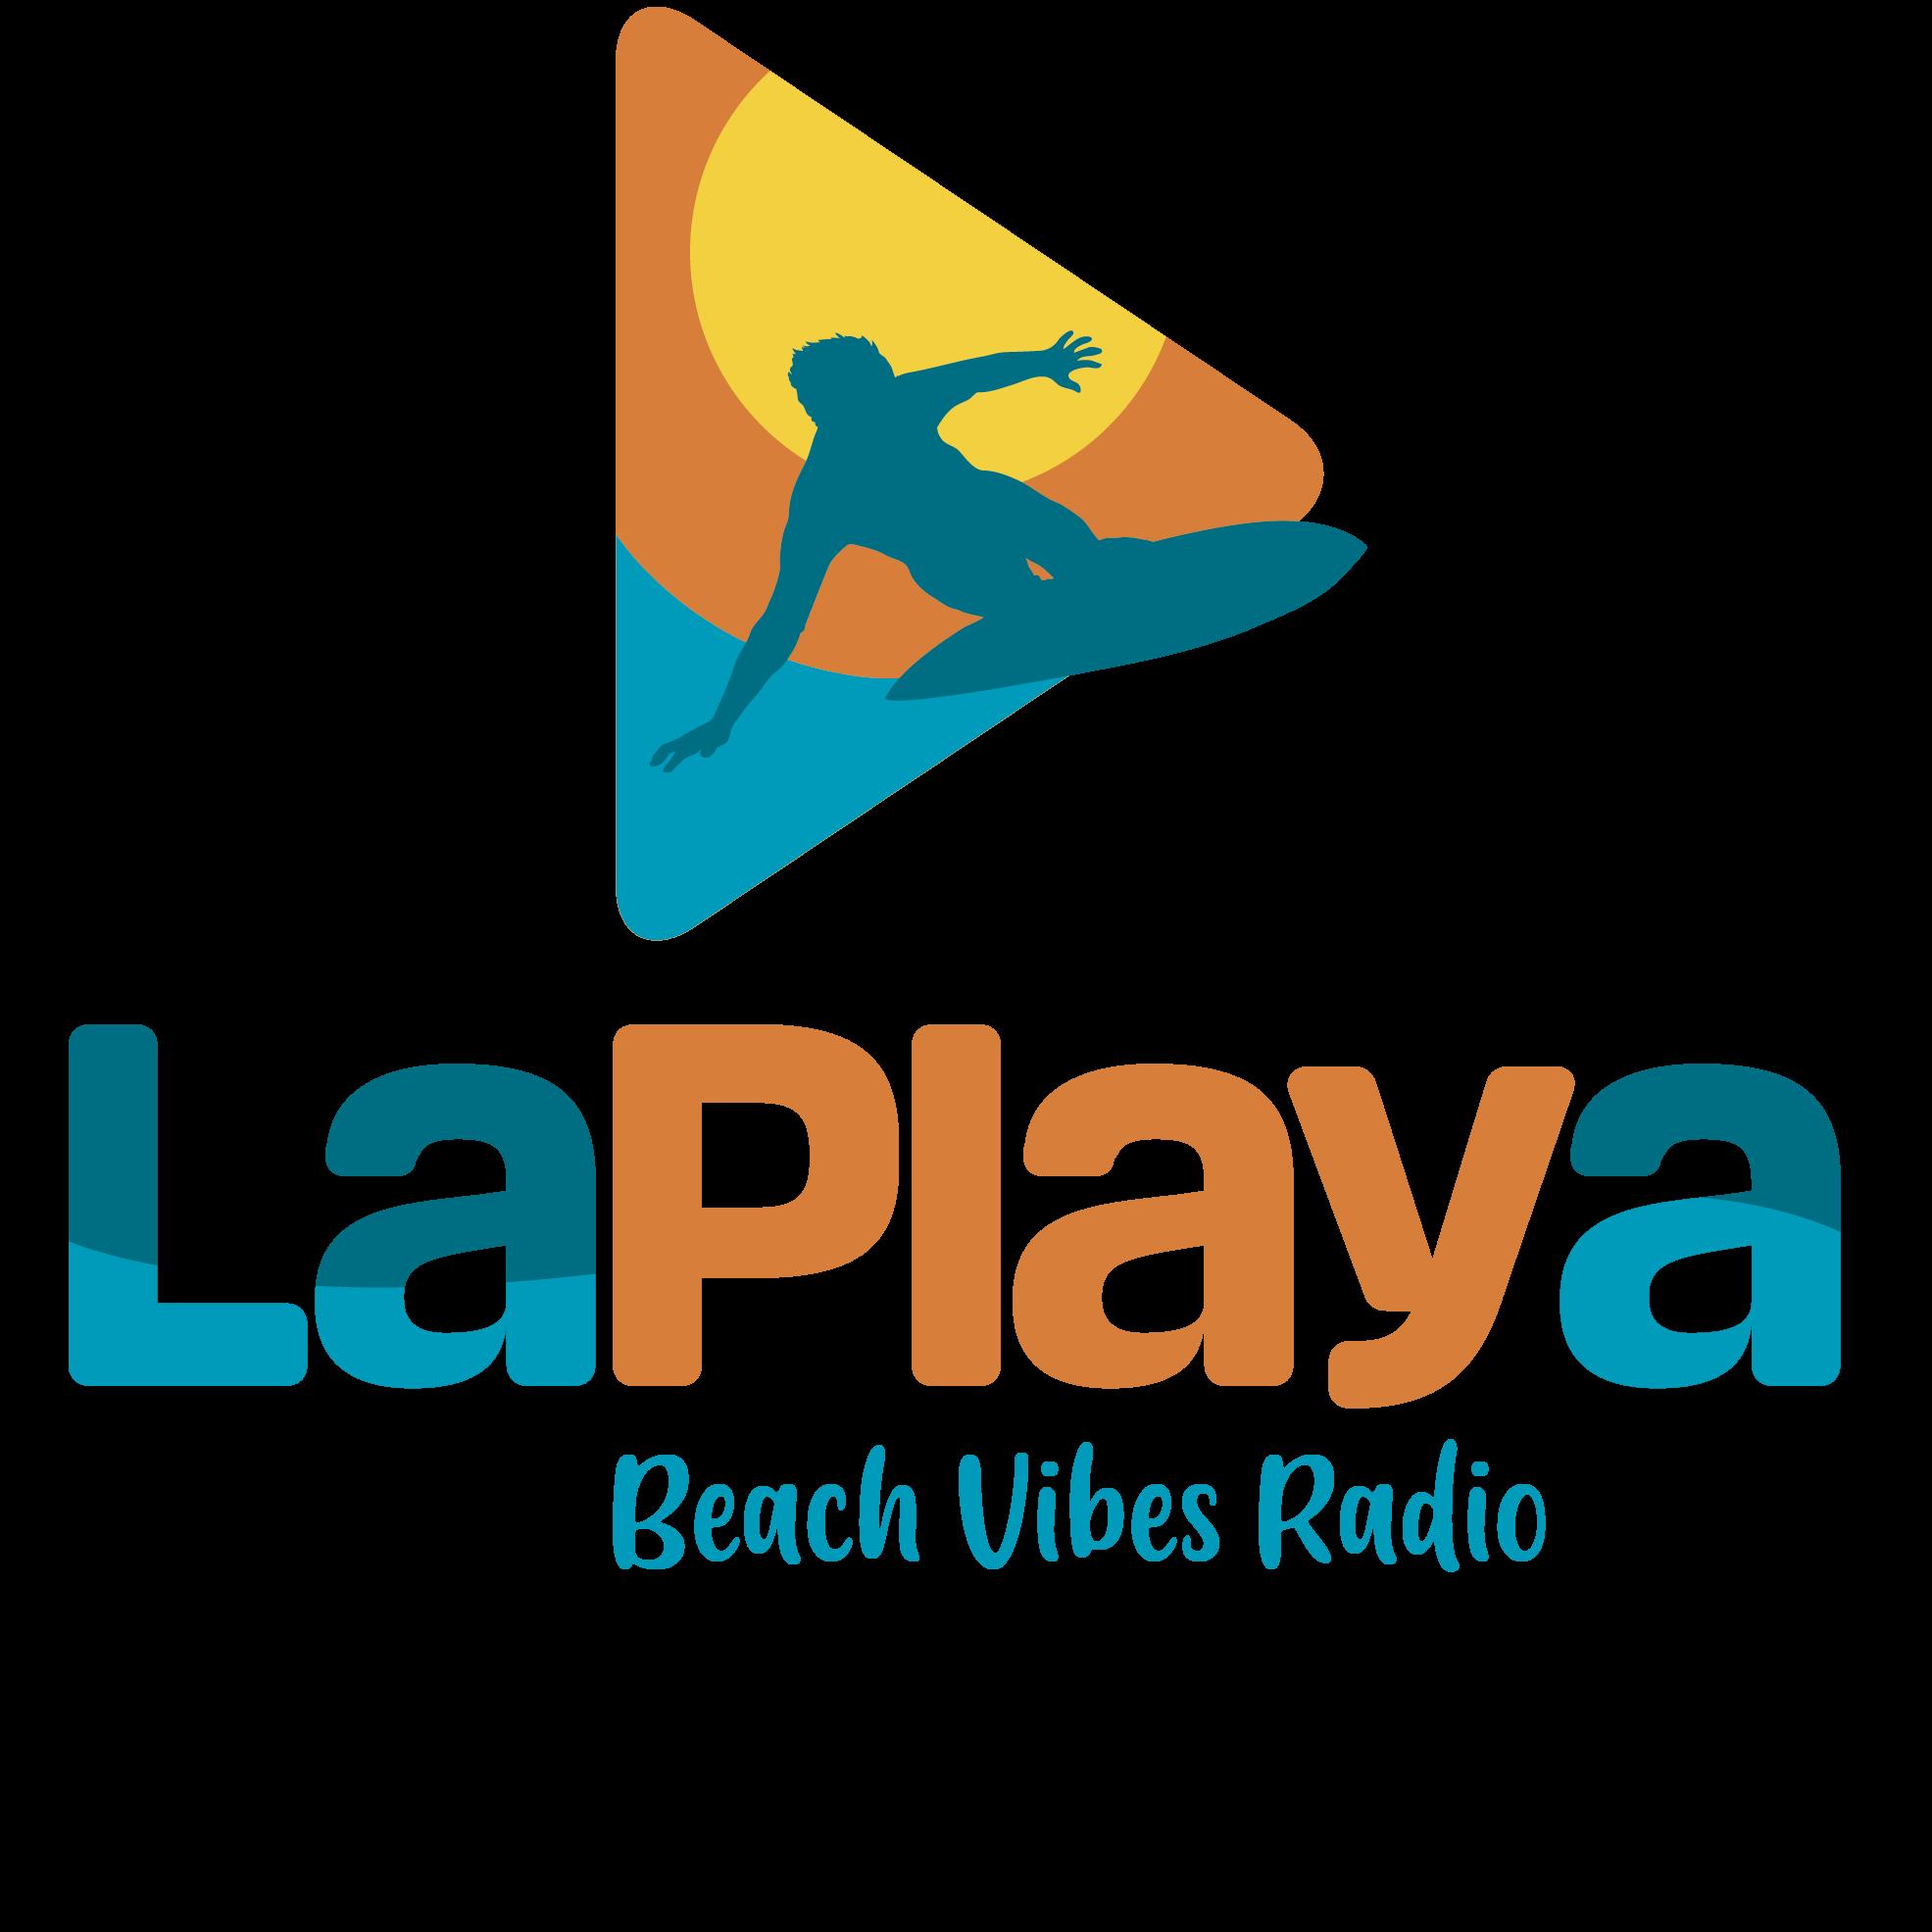 La Playa Beach Vibes Radio